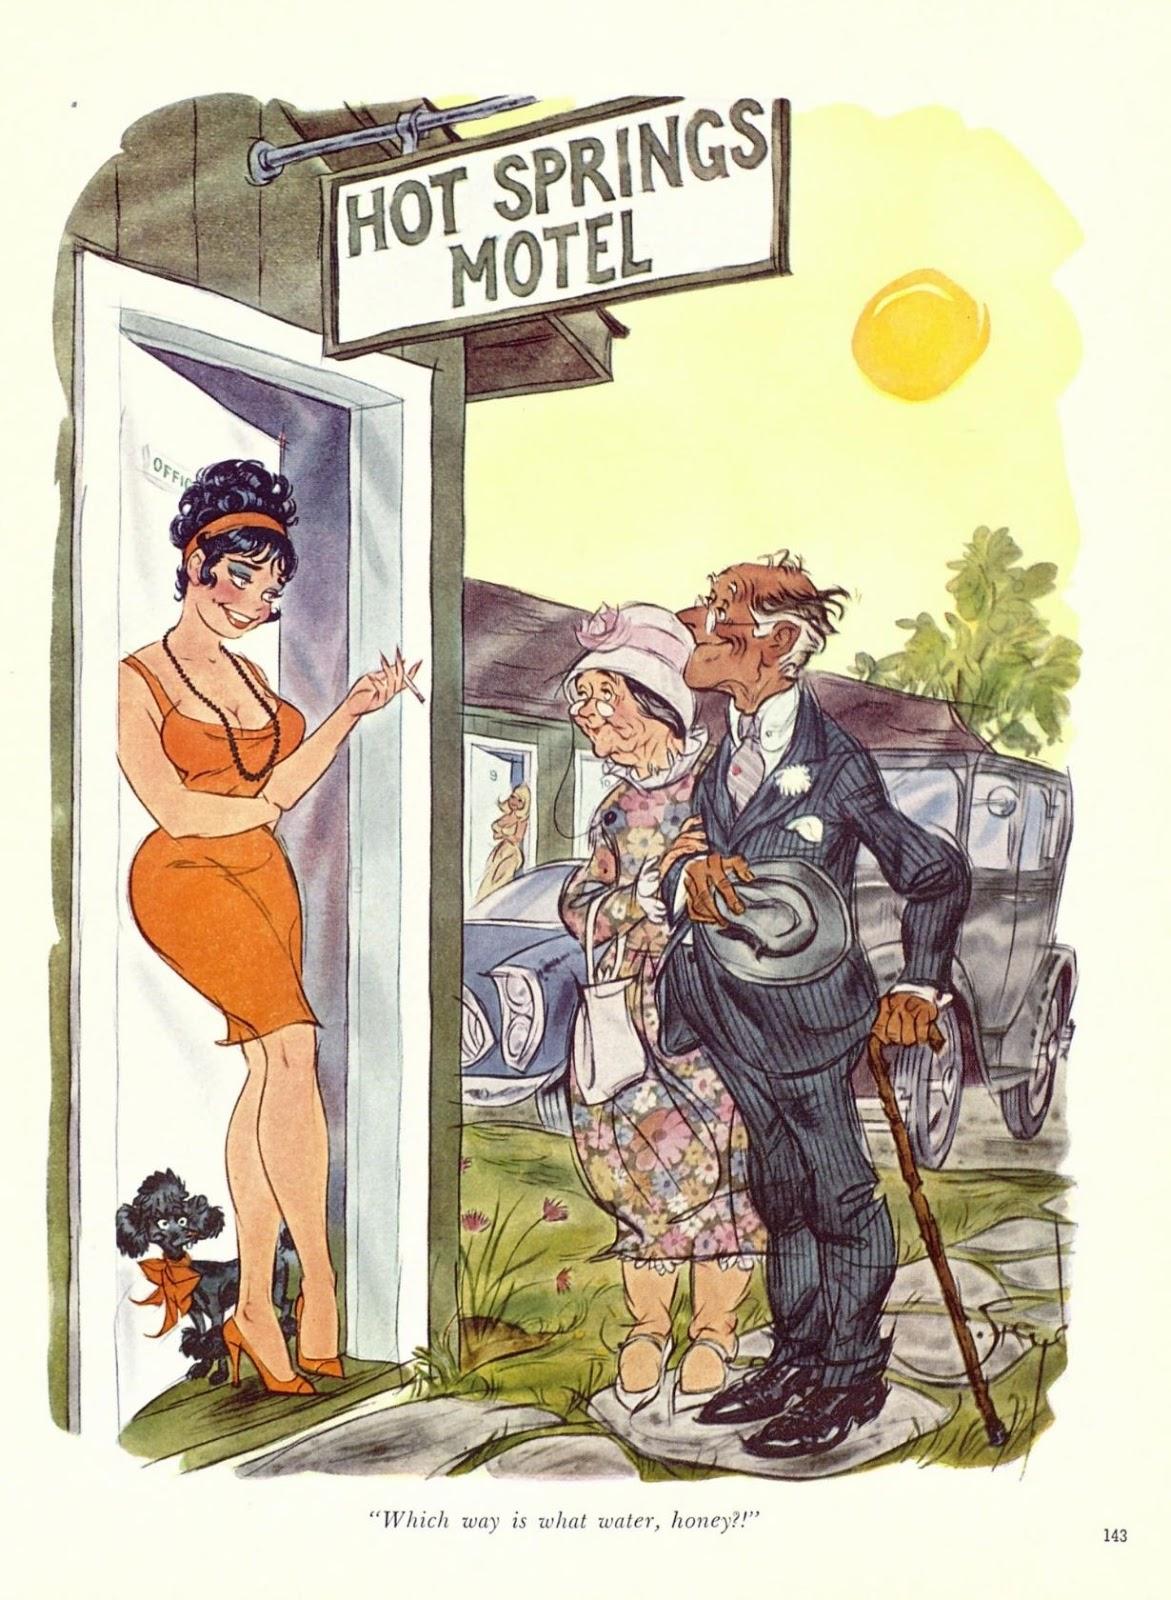 Doug Sneyd Playboy Cartoons 1960s Vintage Arts Gallery